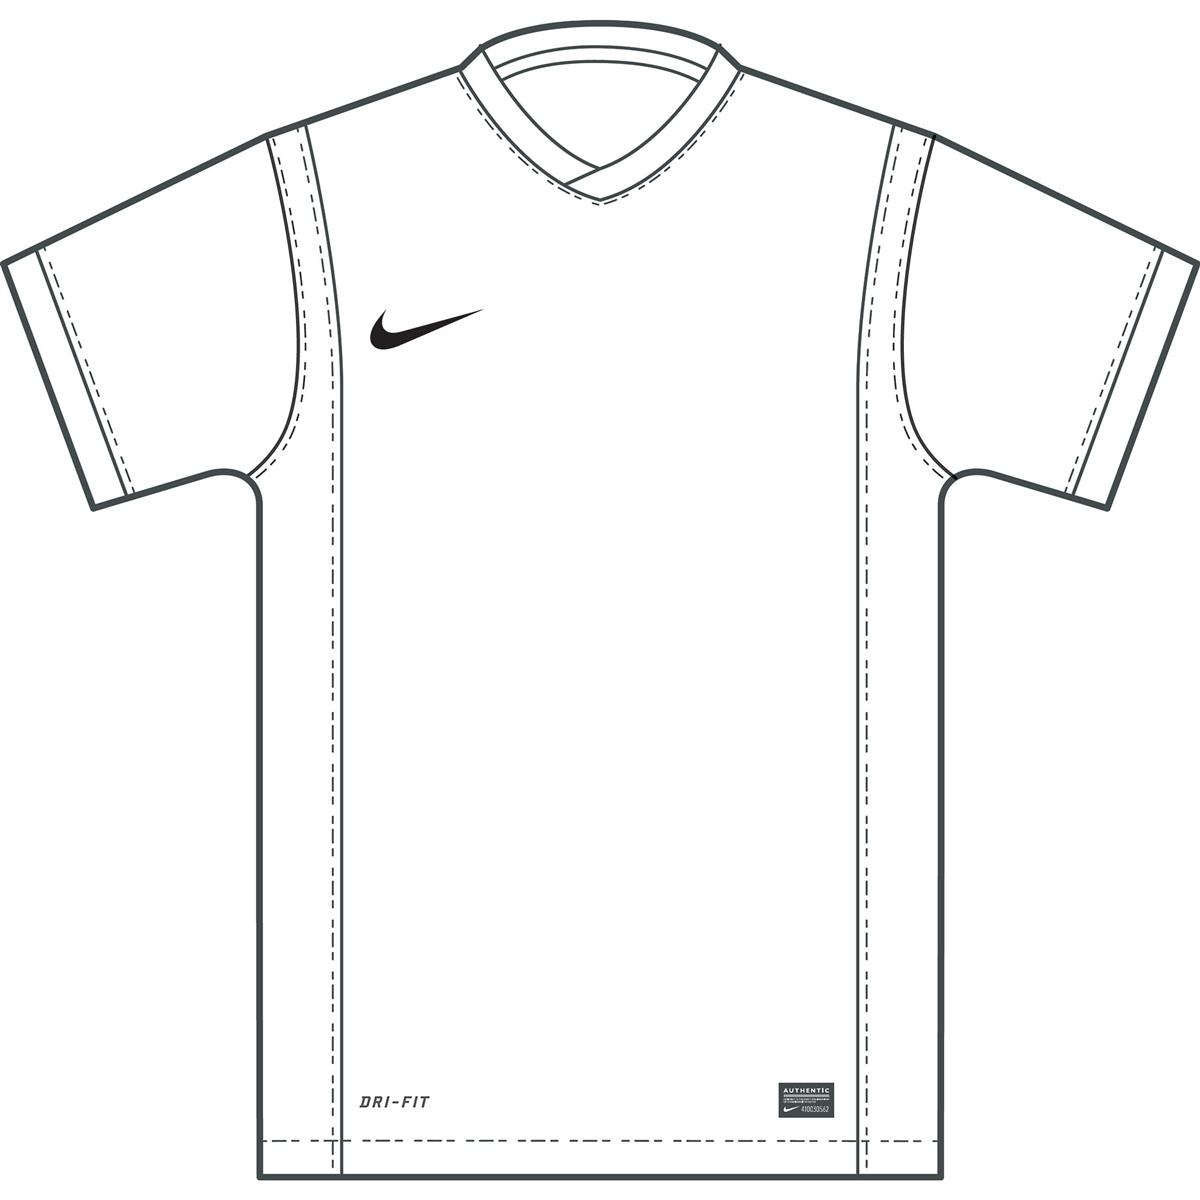 Nike 14 15 Teamwear Kits Nike 2014 2015 Templates